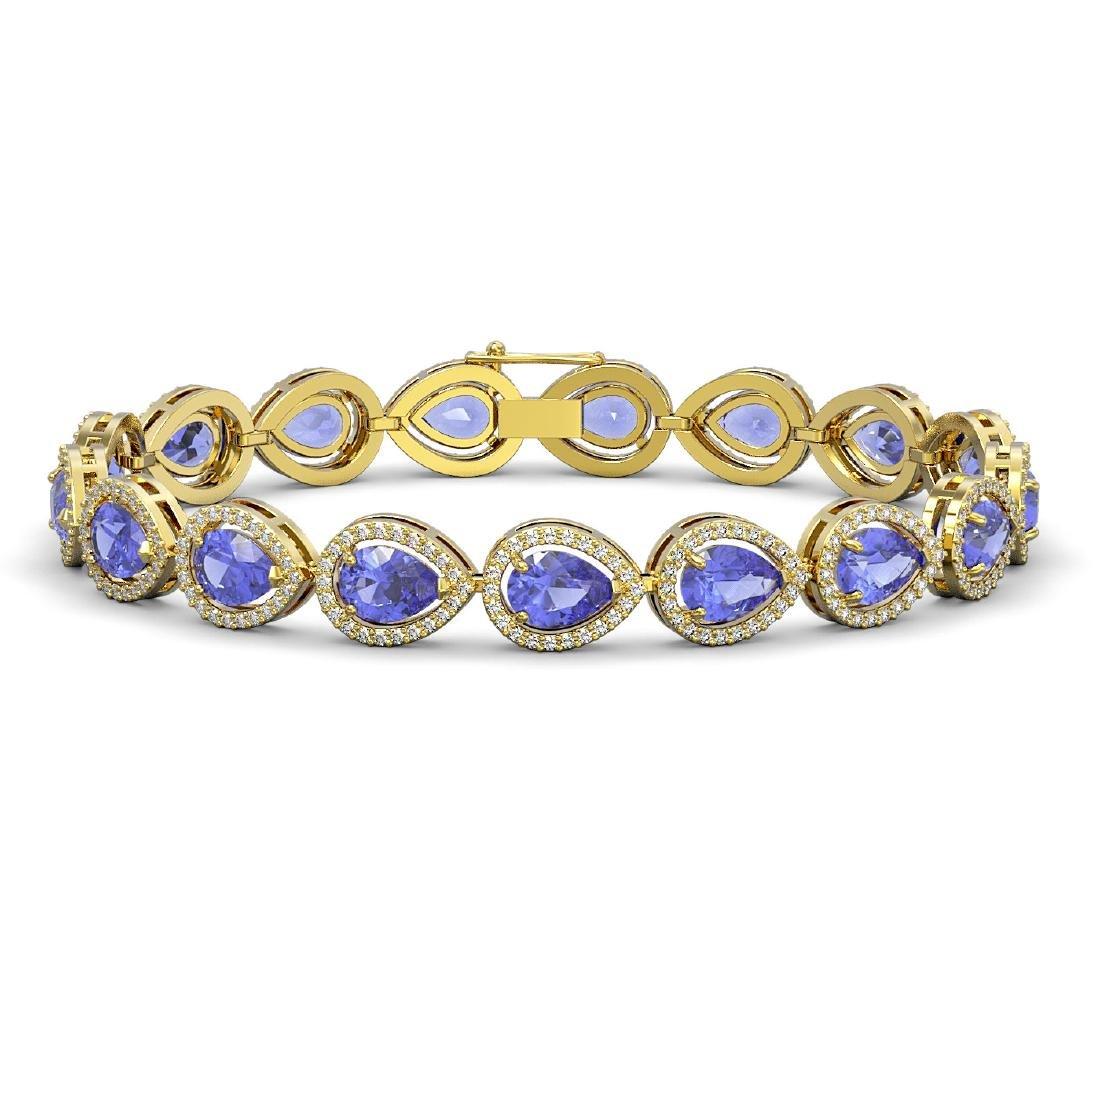 19.14 CTW Tanzanite & Diamond Halo Bracelet 10K Yellow